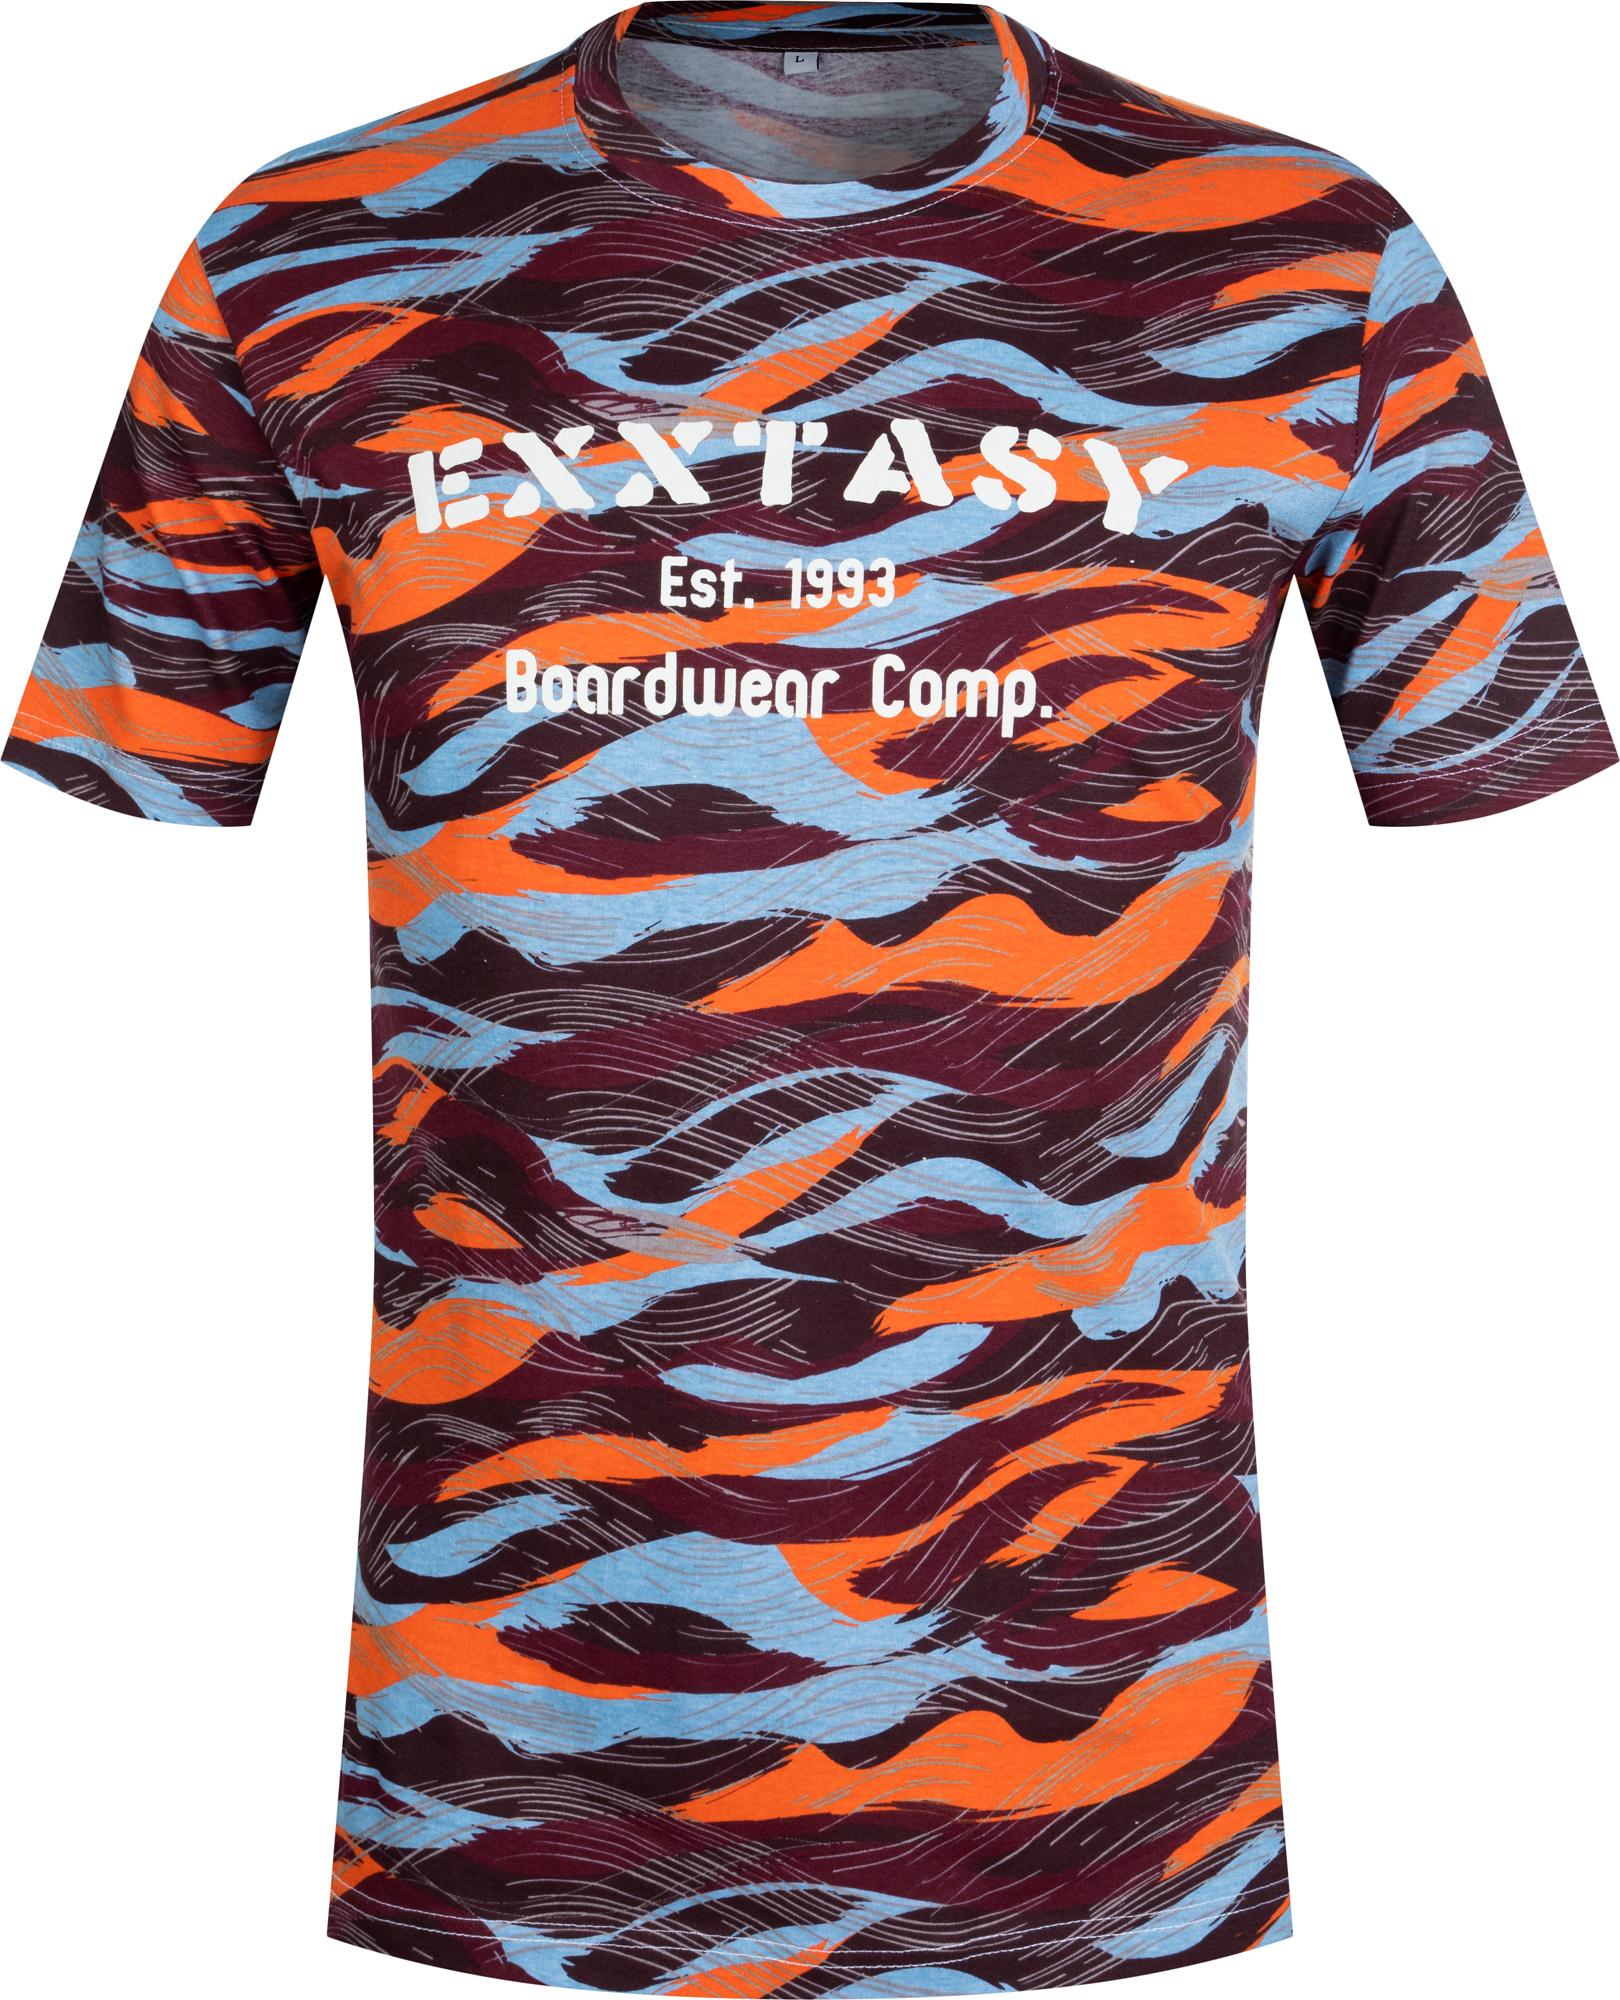 Exxtasy Футболка мужская Exxtasy Warwick, размер 54-56 exxtasy шорты пляжные мужские exxtasy tracy размер 54 56